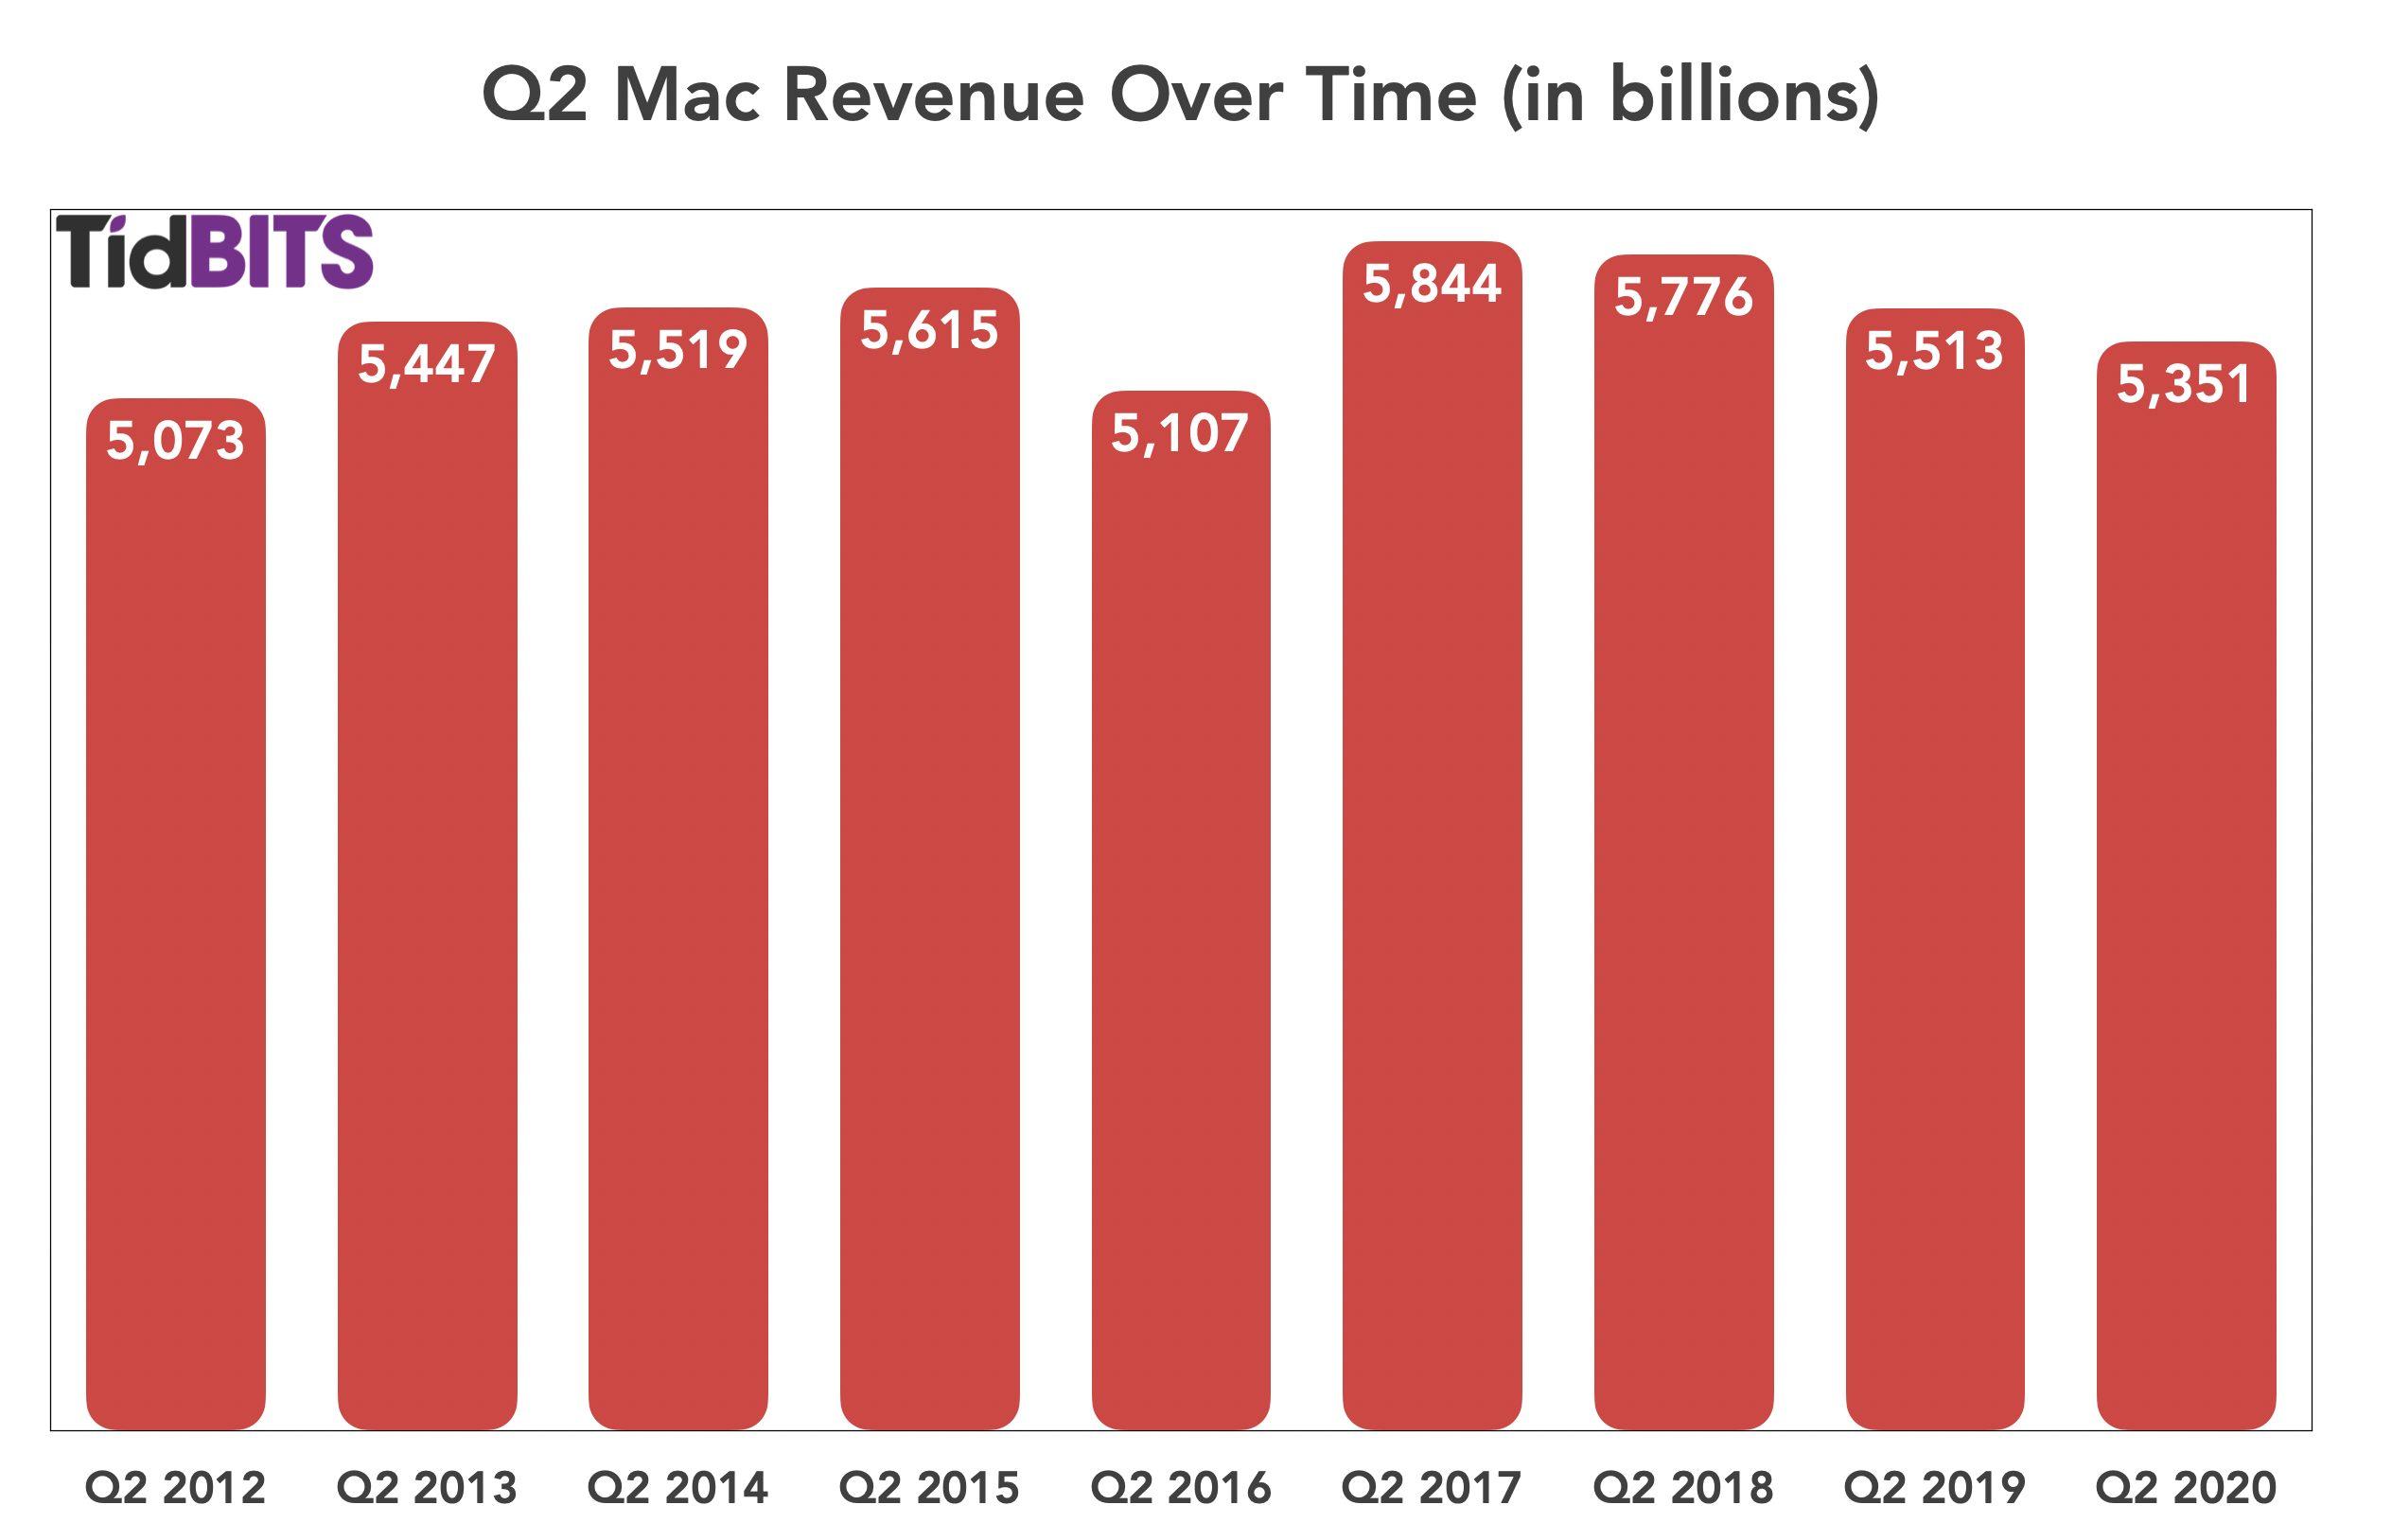 Apple Mac Q2 2020